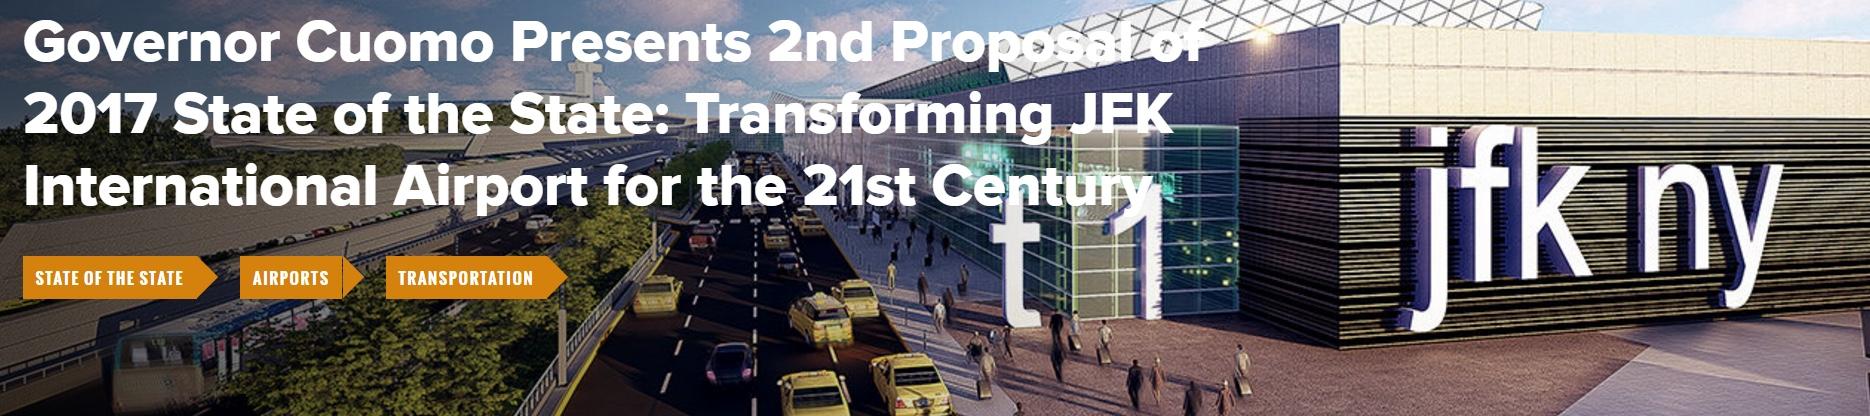 JFK 10 Billion Upgrade